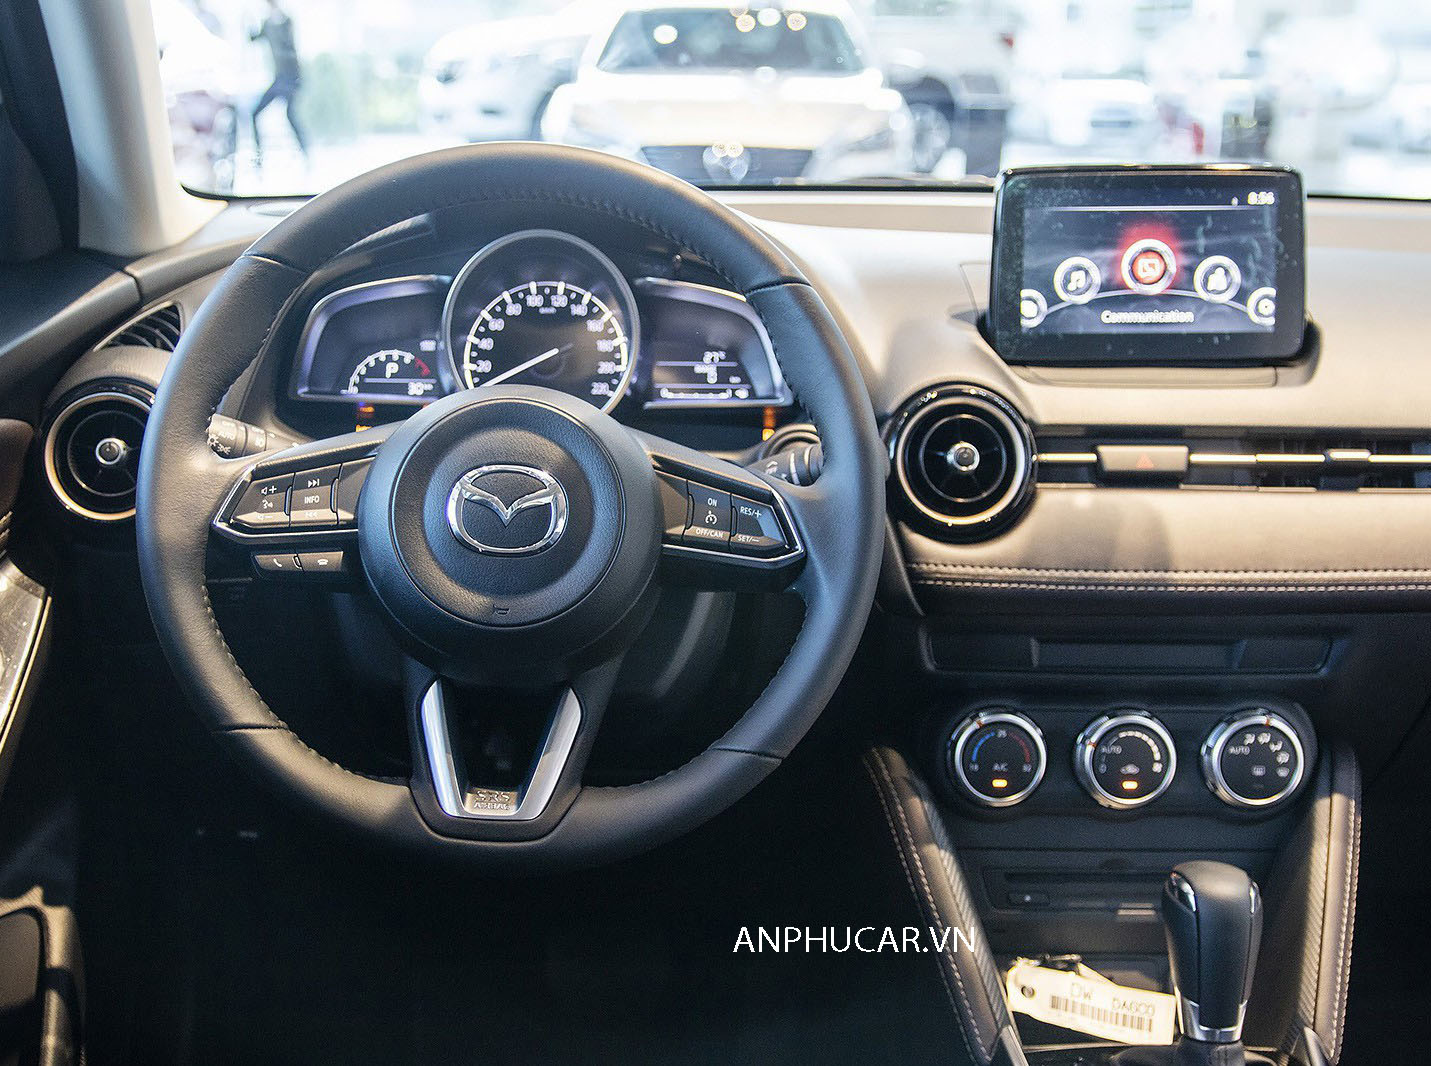 Nội thất xe Mazda 2 2020 mới